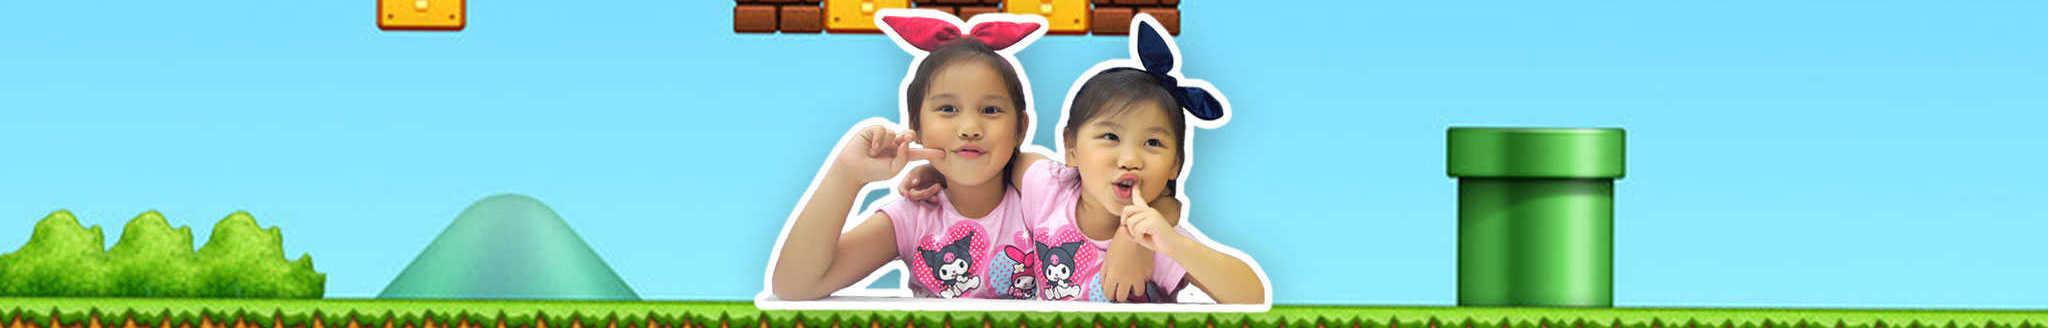 Sunny-Yummy的玩具箱 banner